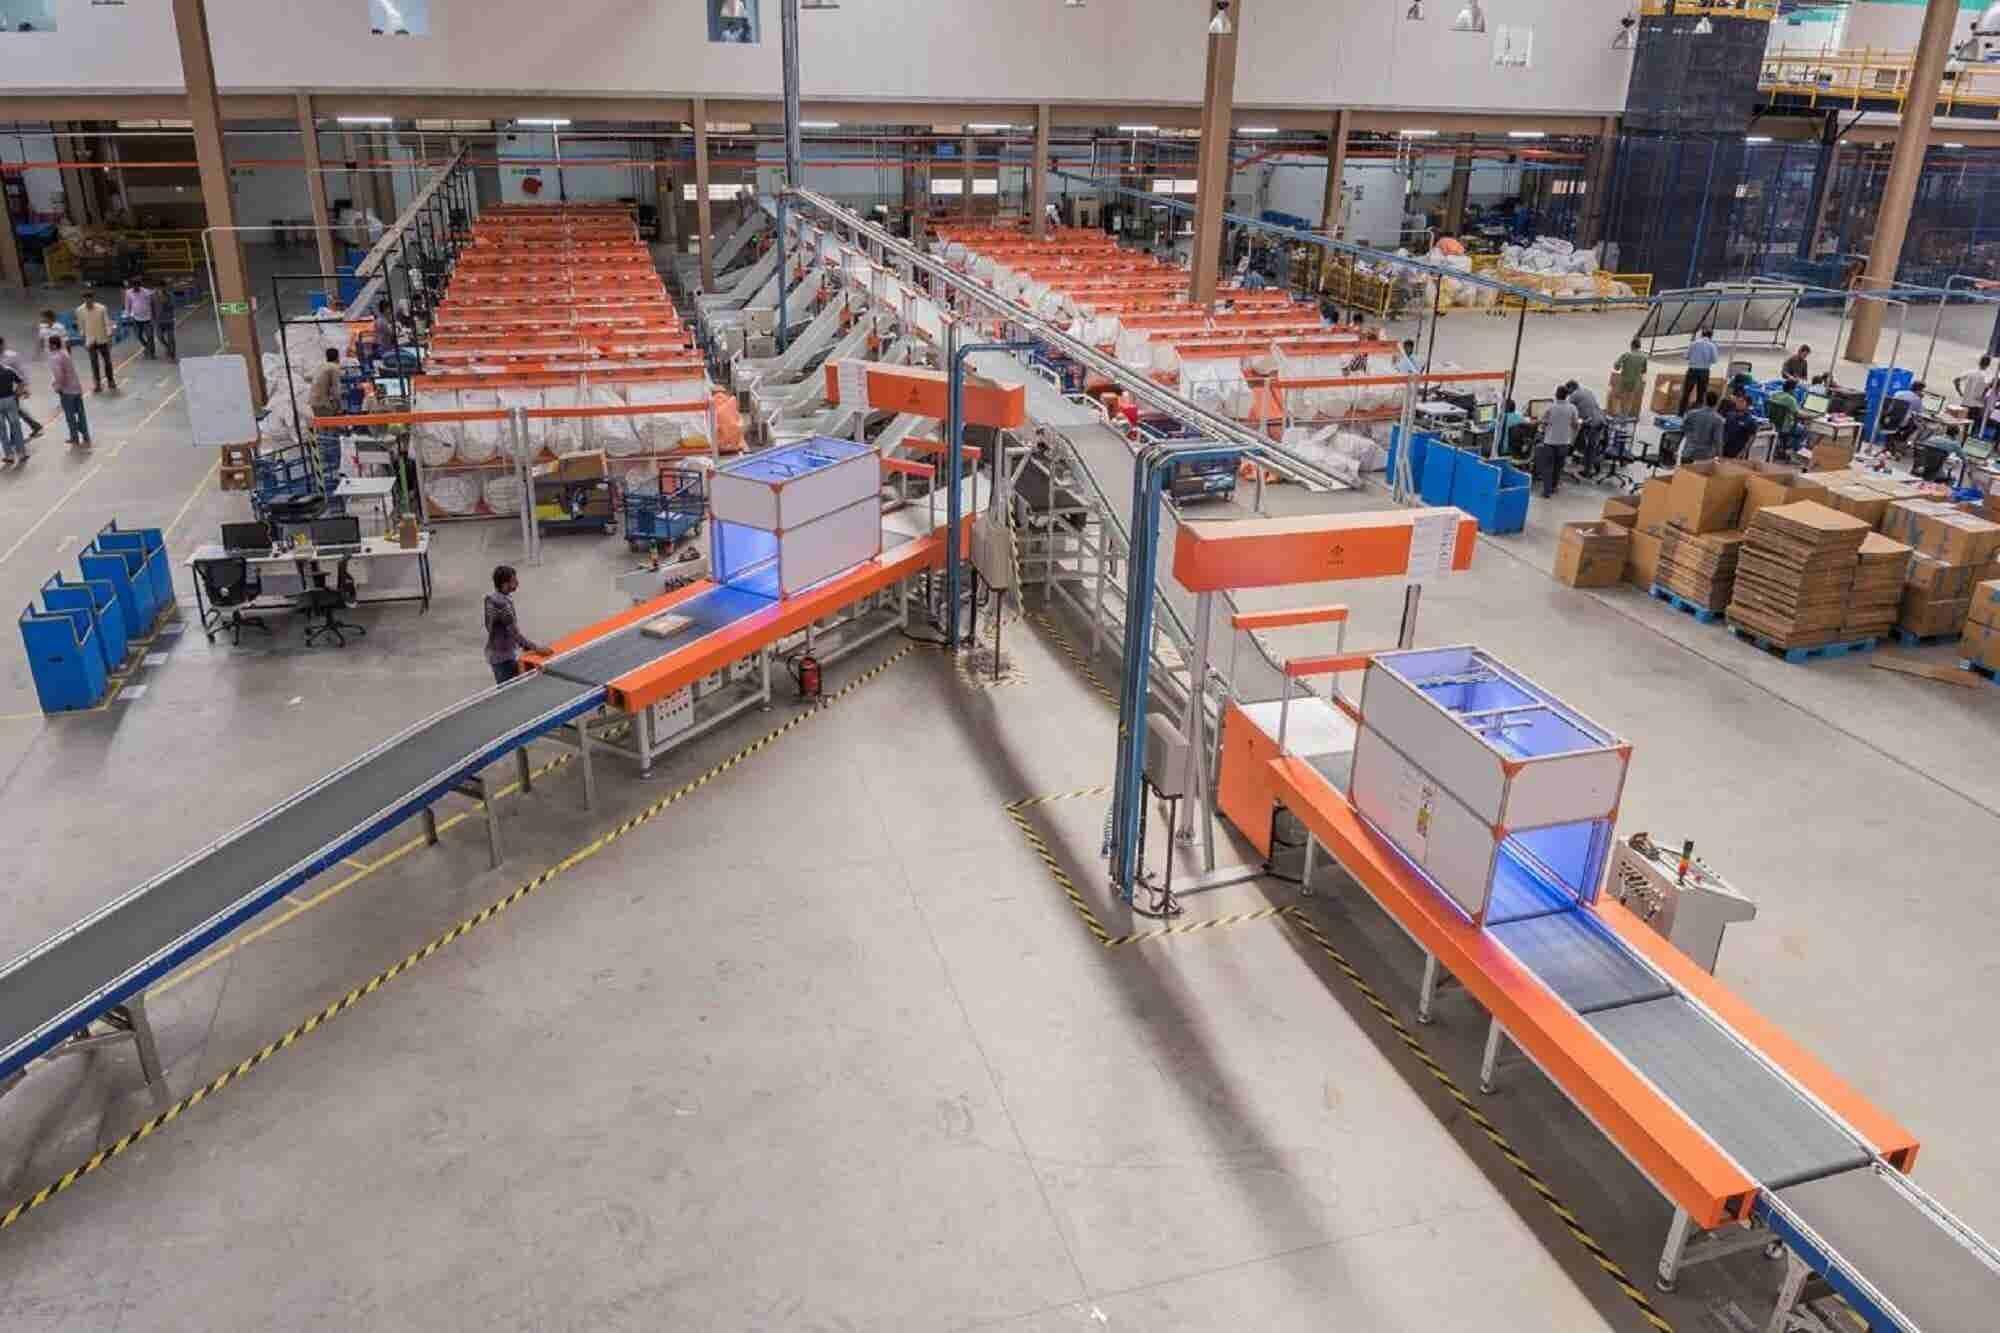 Robotics Startup GreyOrange Nabs $140 Million Series C Funding From Mithril Capital & Others